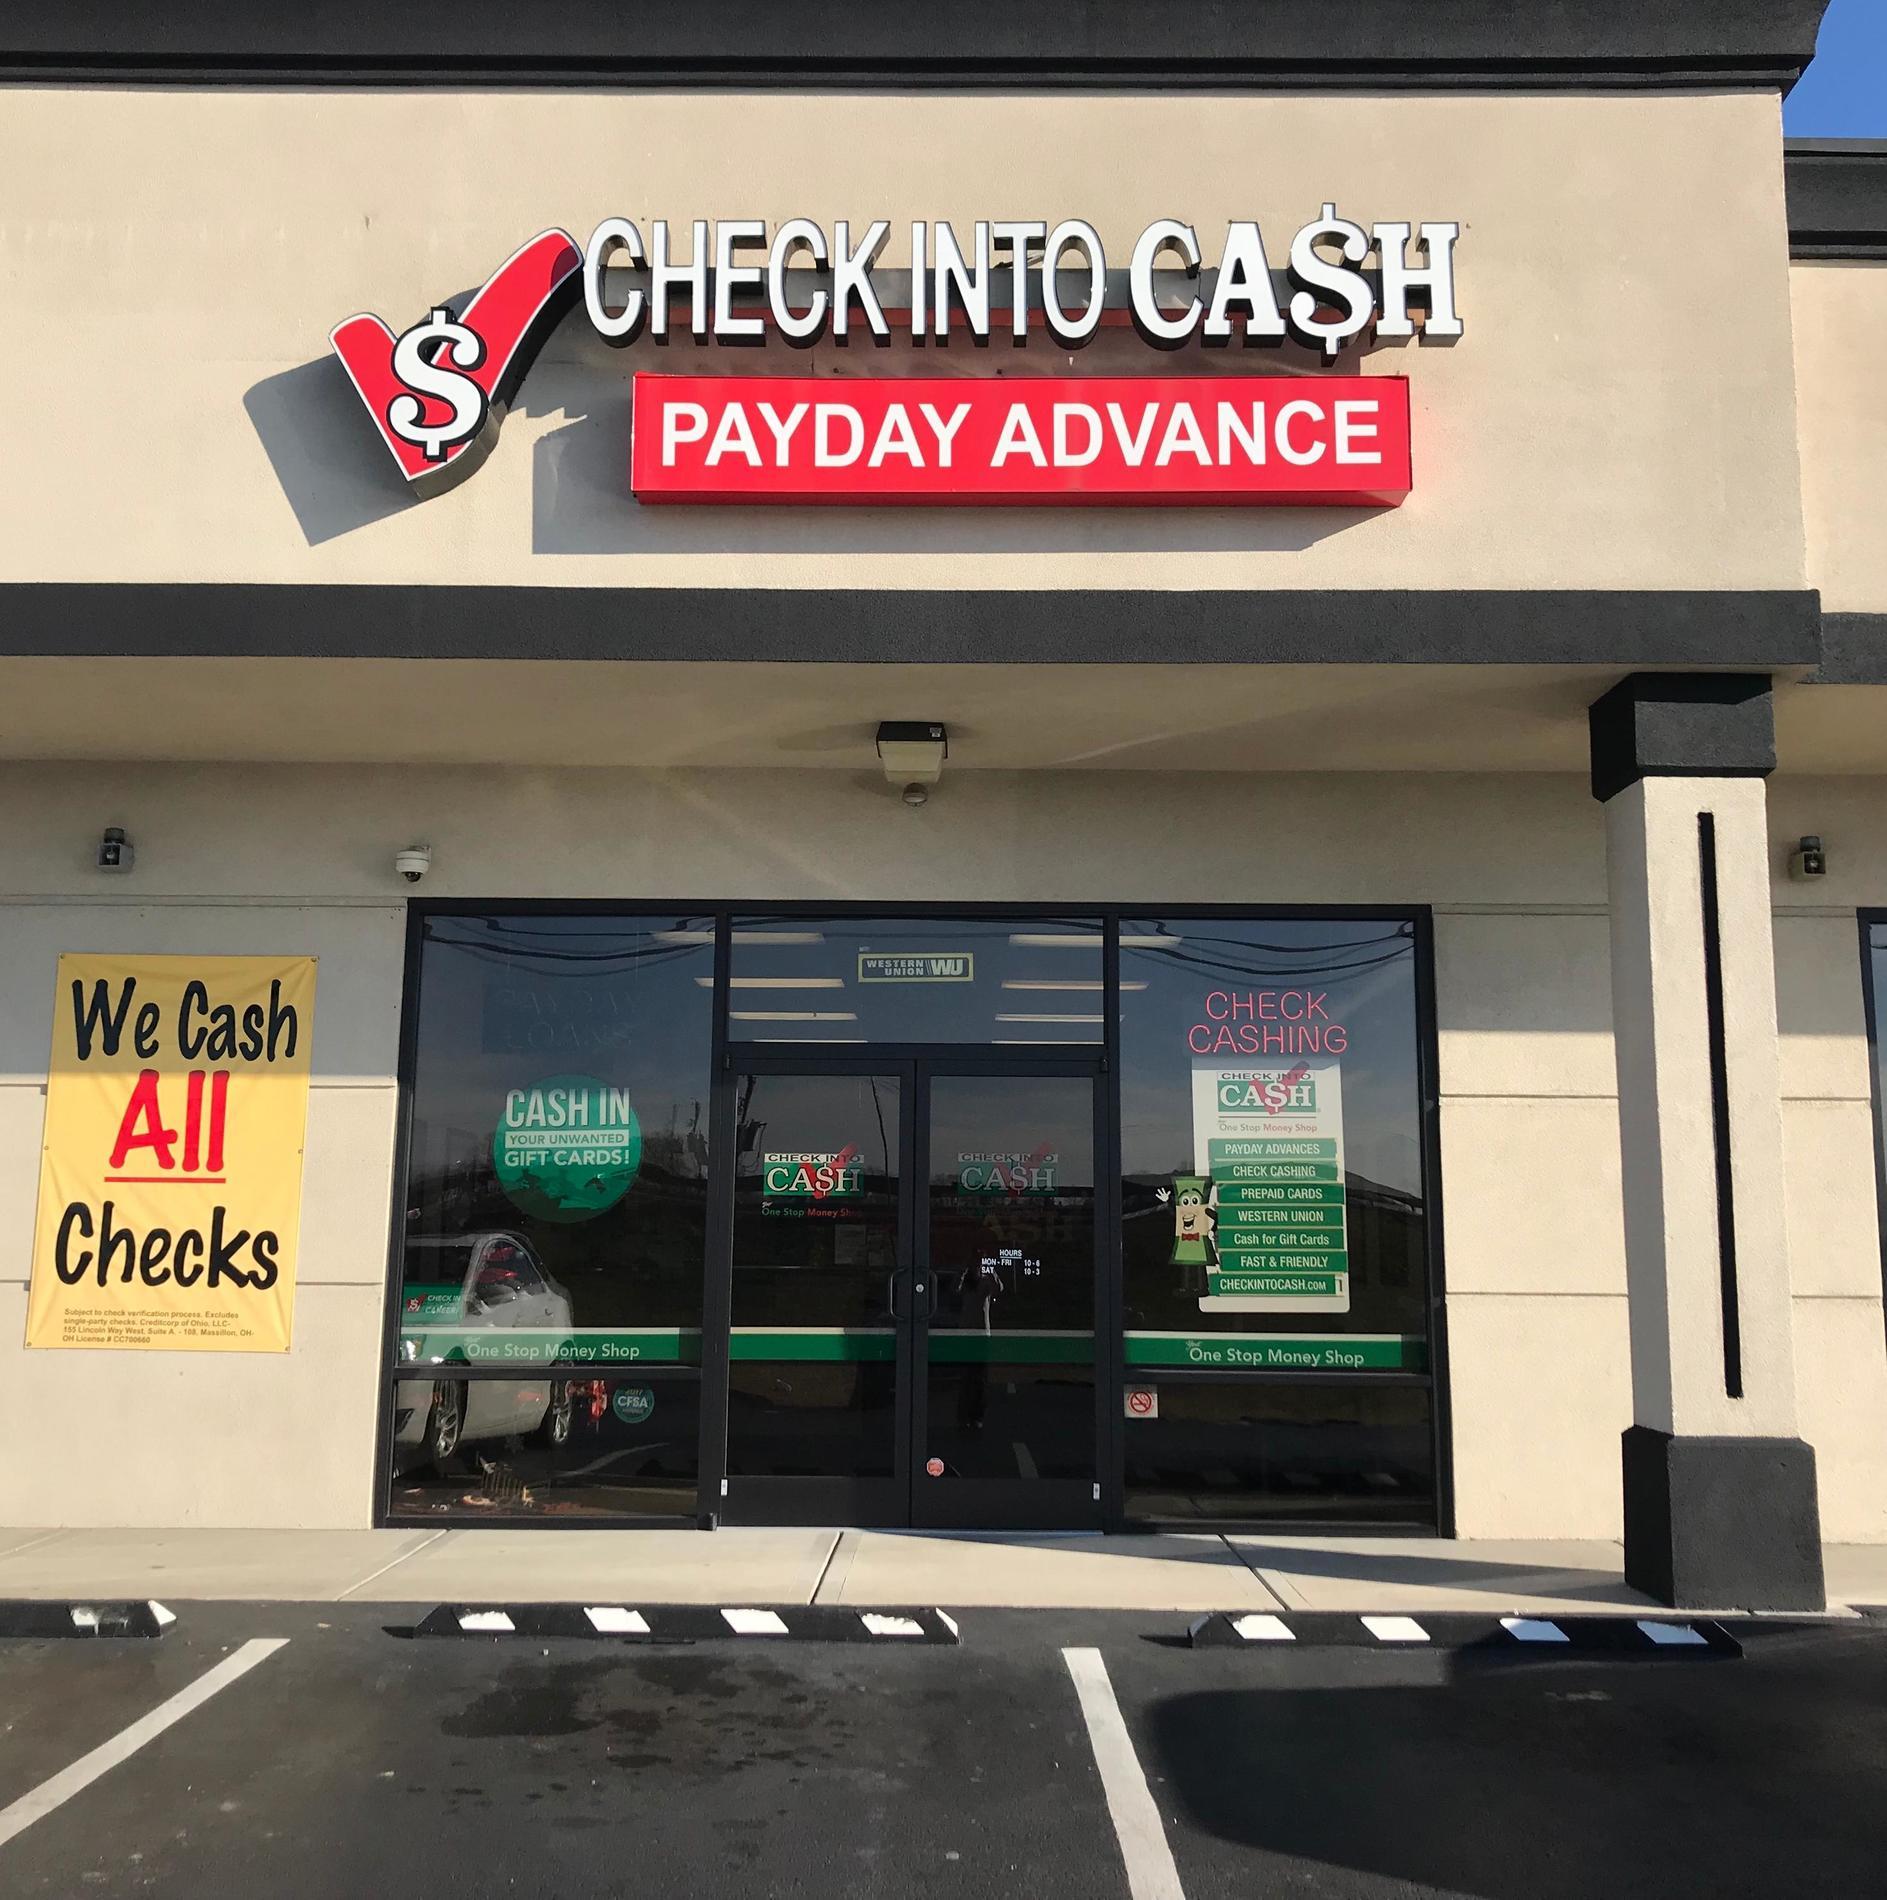 Chase cash advance image 8